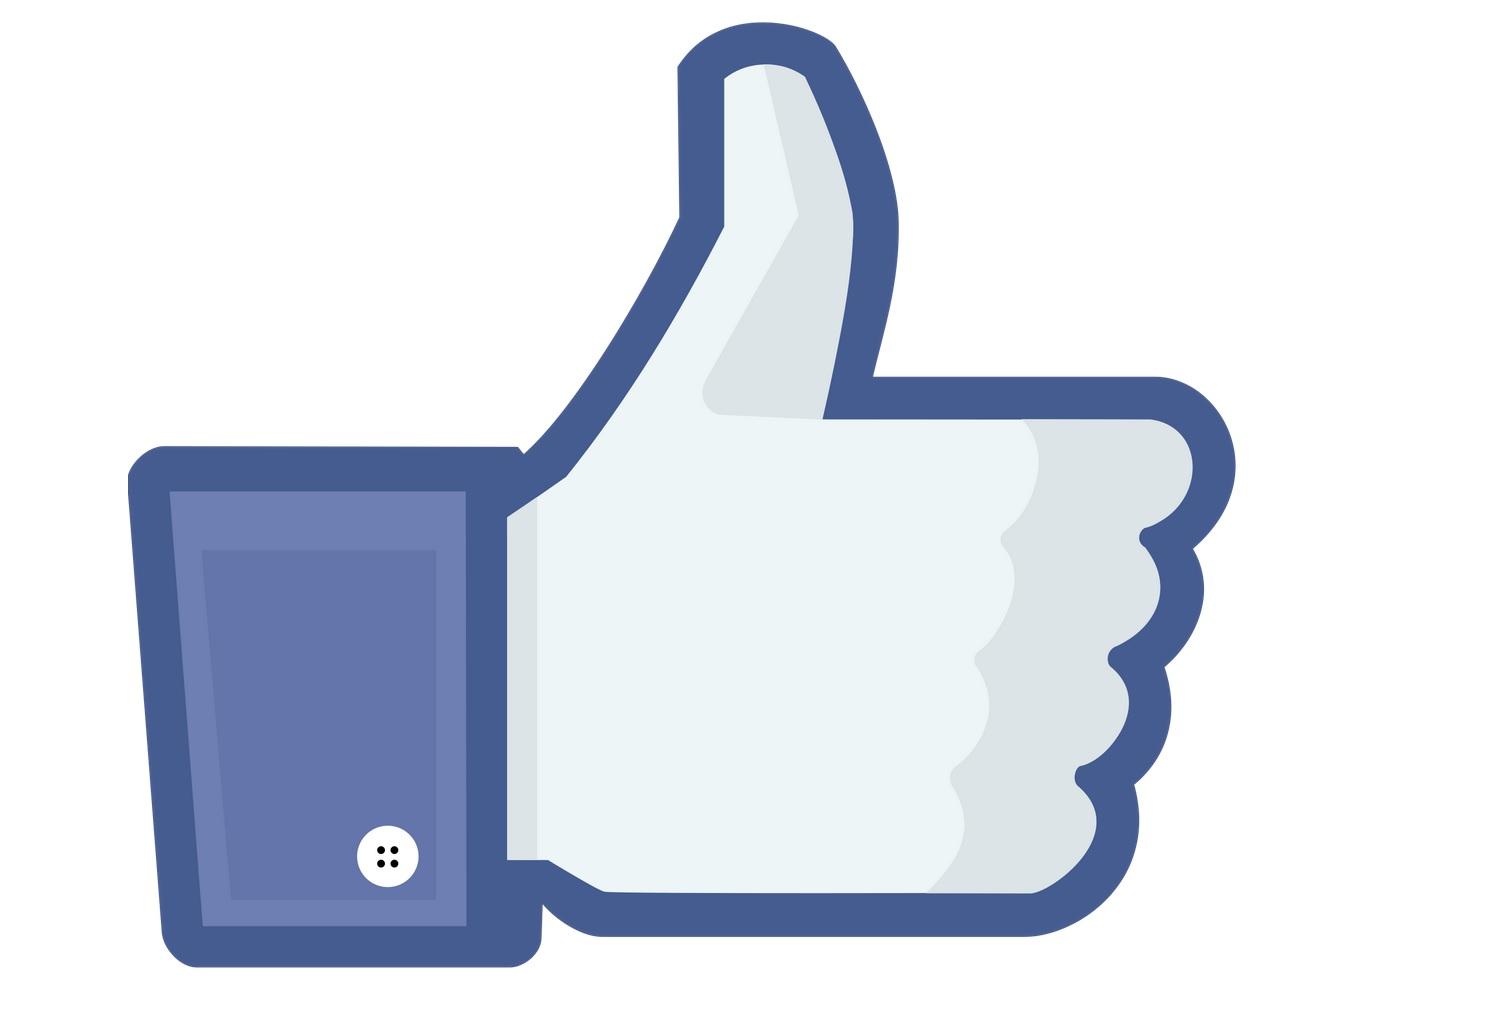 Facebook schrapt privacyoptie die gebruikers 39 onvindbaar for Facebook logo ufficiale